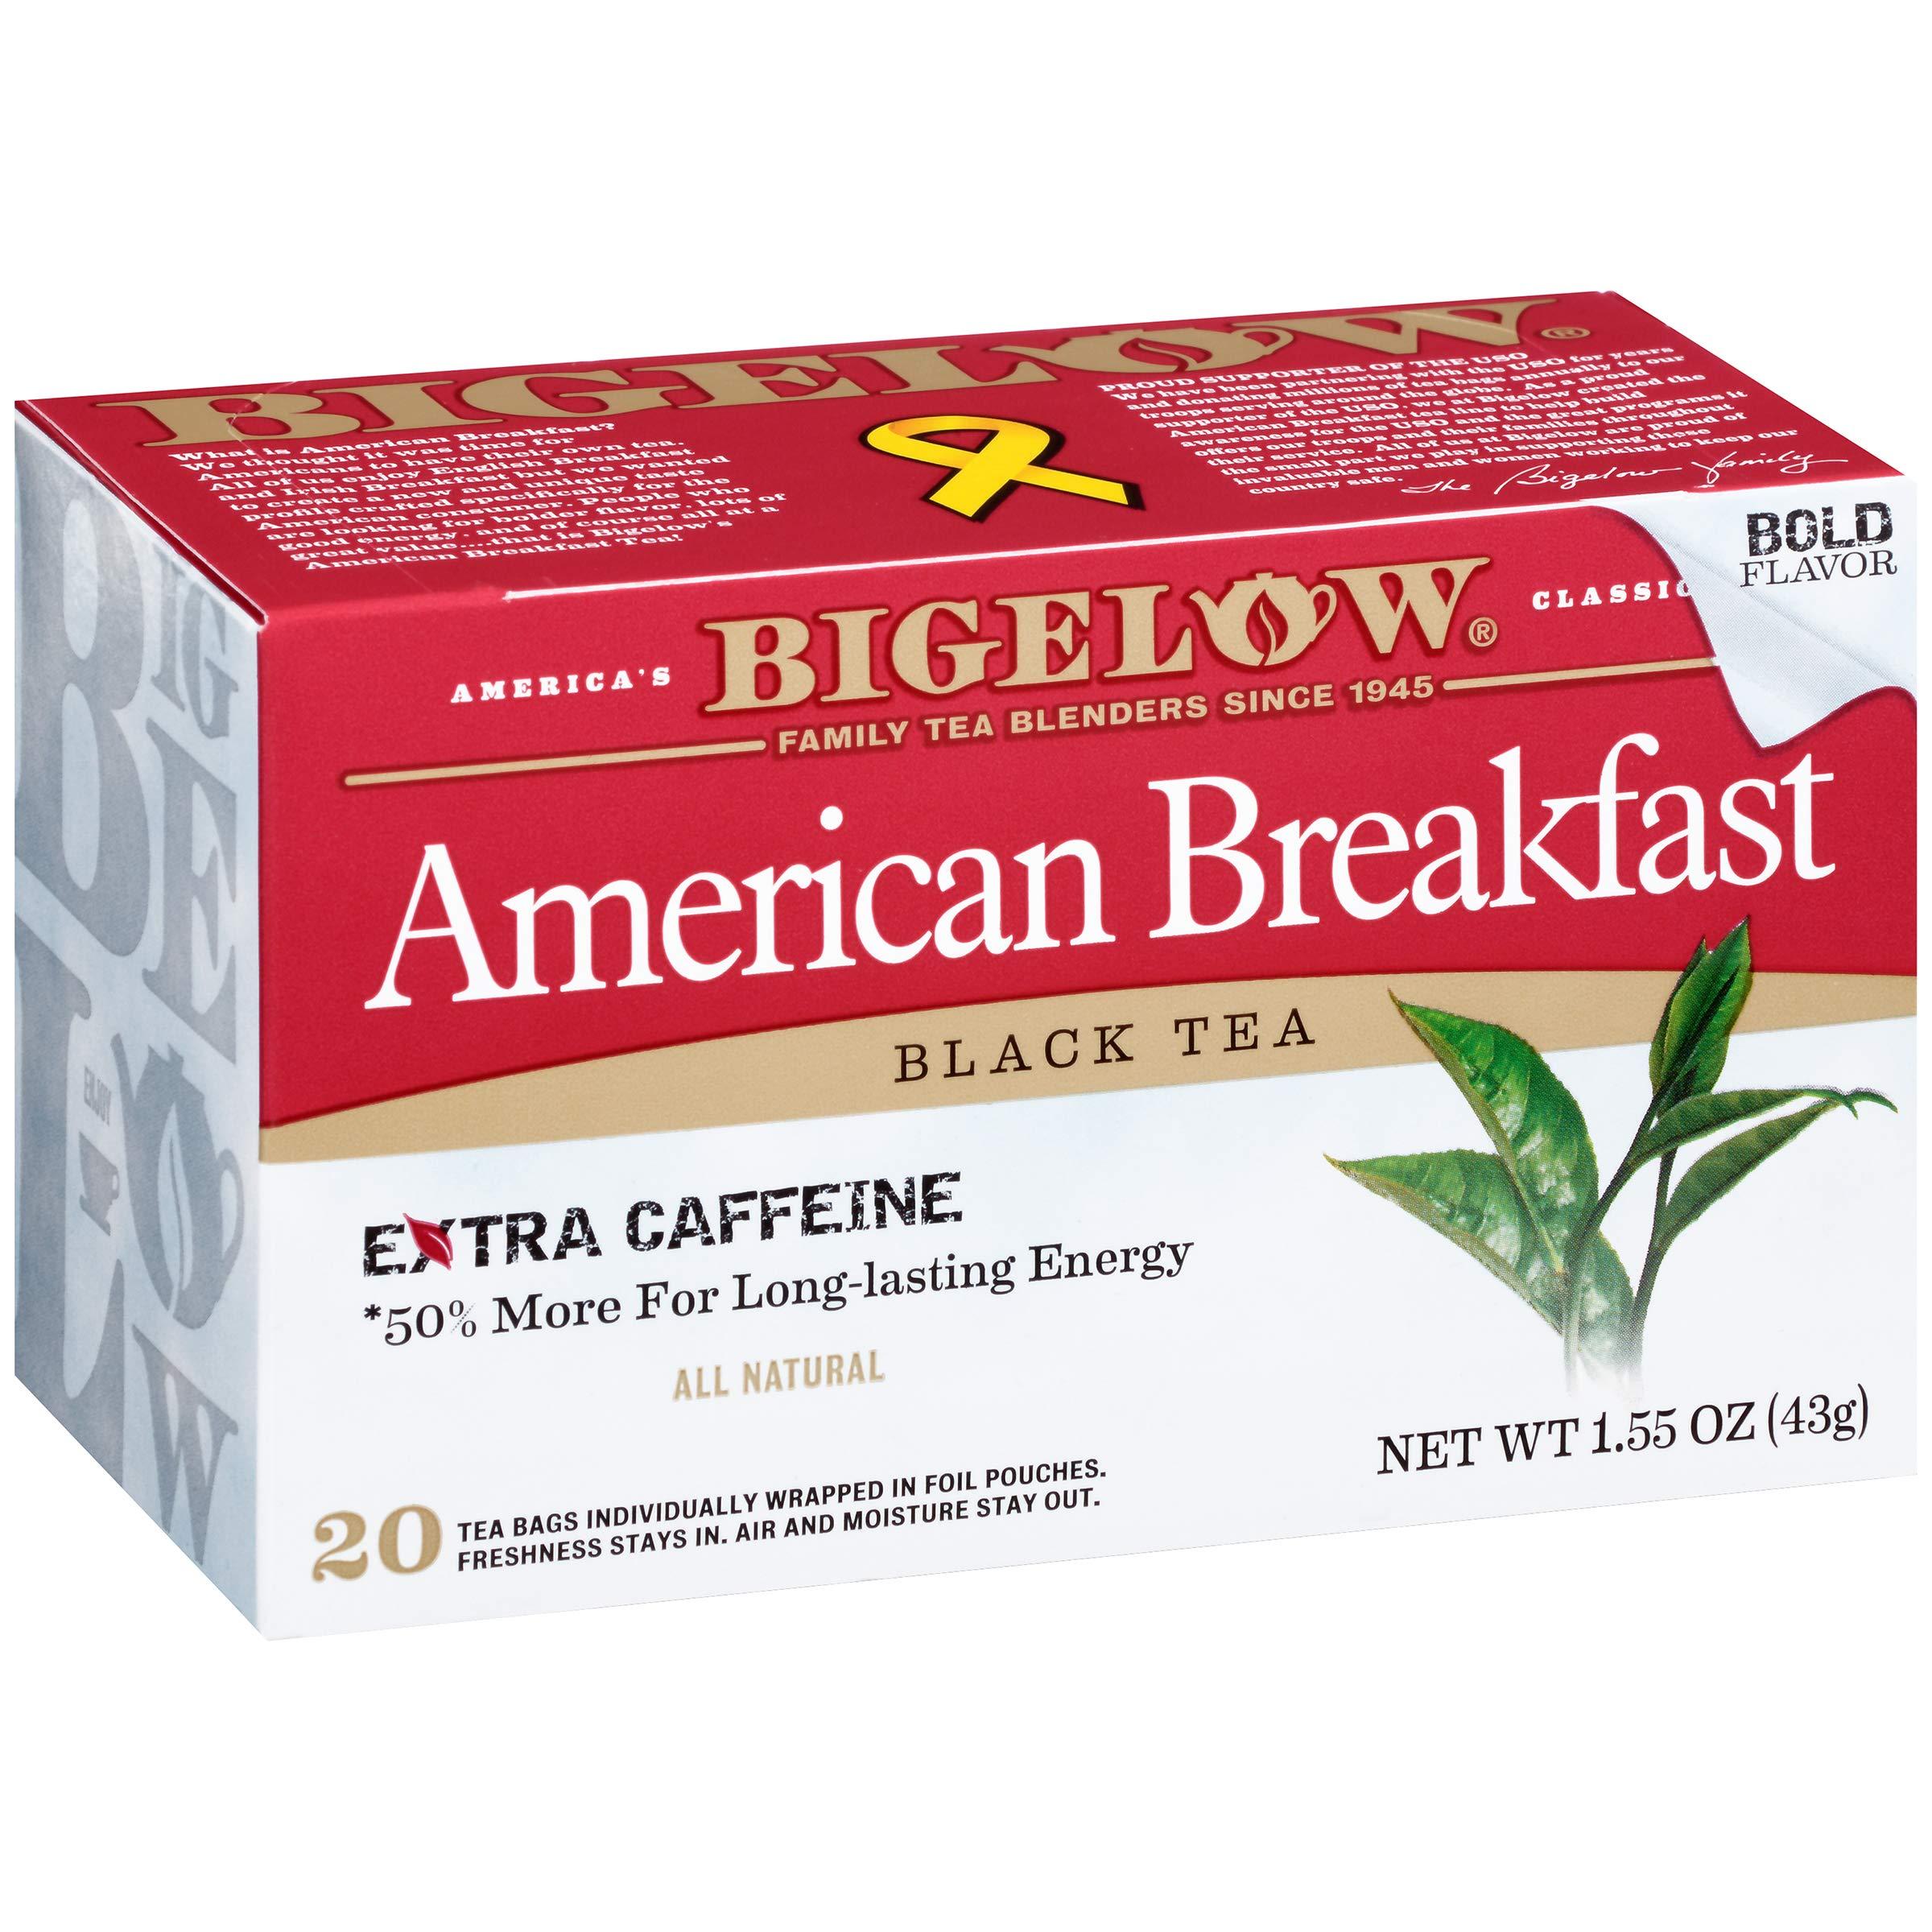 Bigelow American Breakfast Black Tea 20 Bags (Pack of 6), 120 Tea Bags Total.   Caffeinated Individual Black Tea Bags, for Hot Tea or Iced Tea, Drink Plain or Sweetened with Honey or Sugar by Bigelow